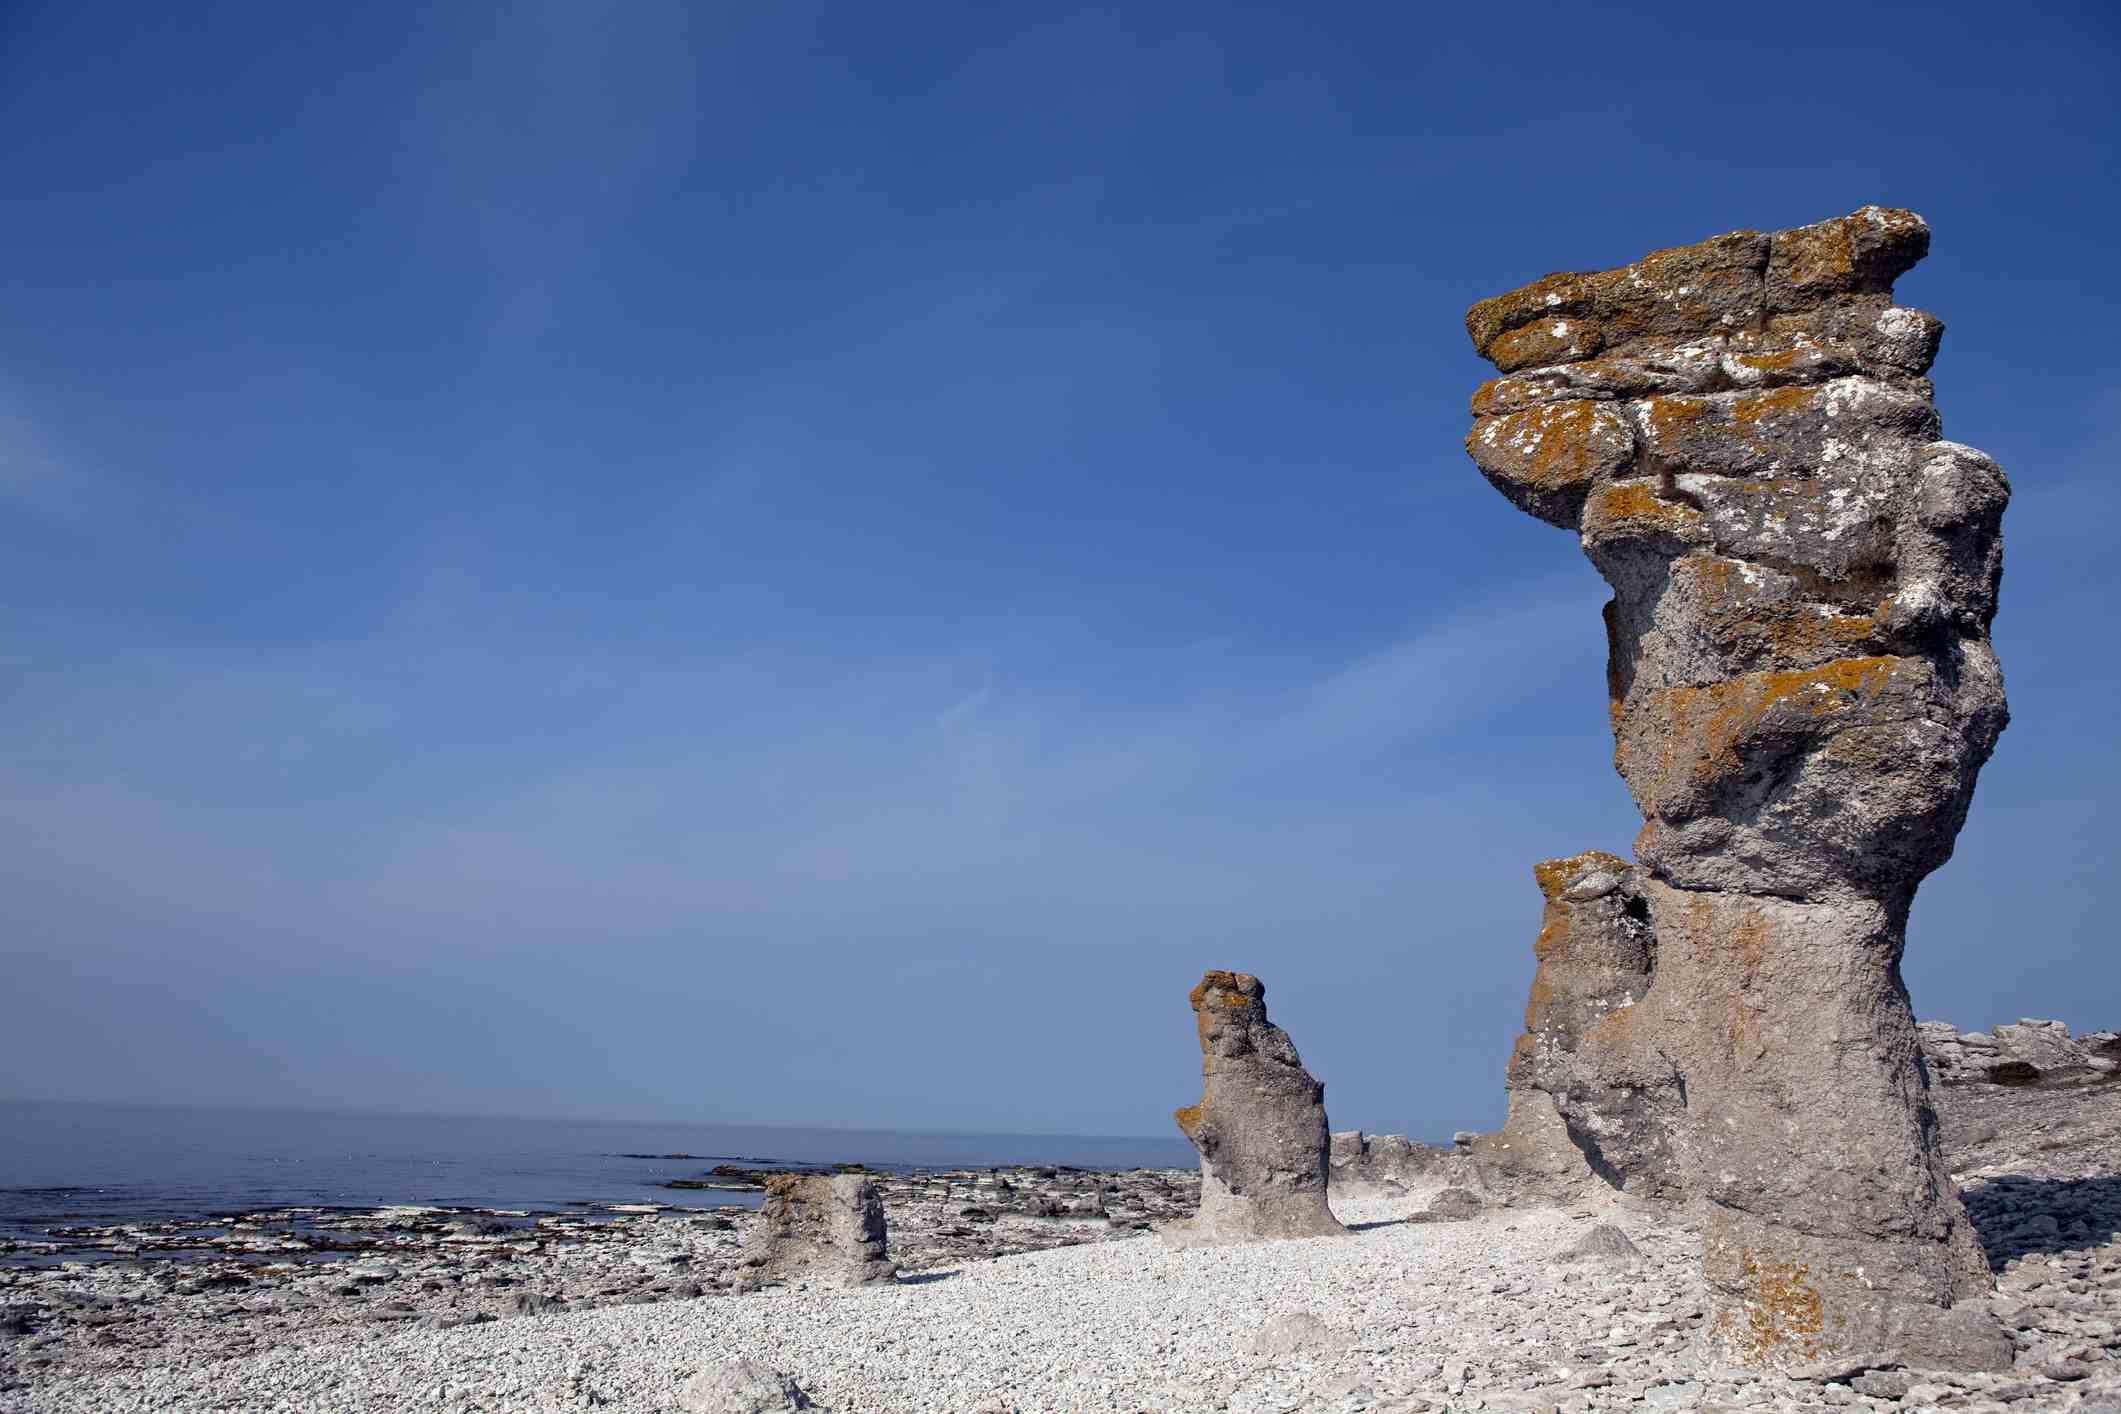 Gotland rock formations